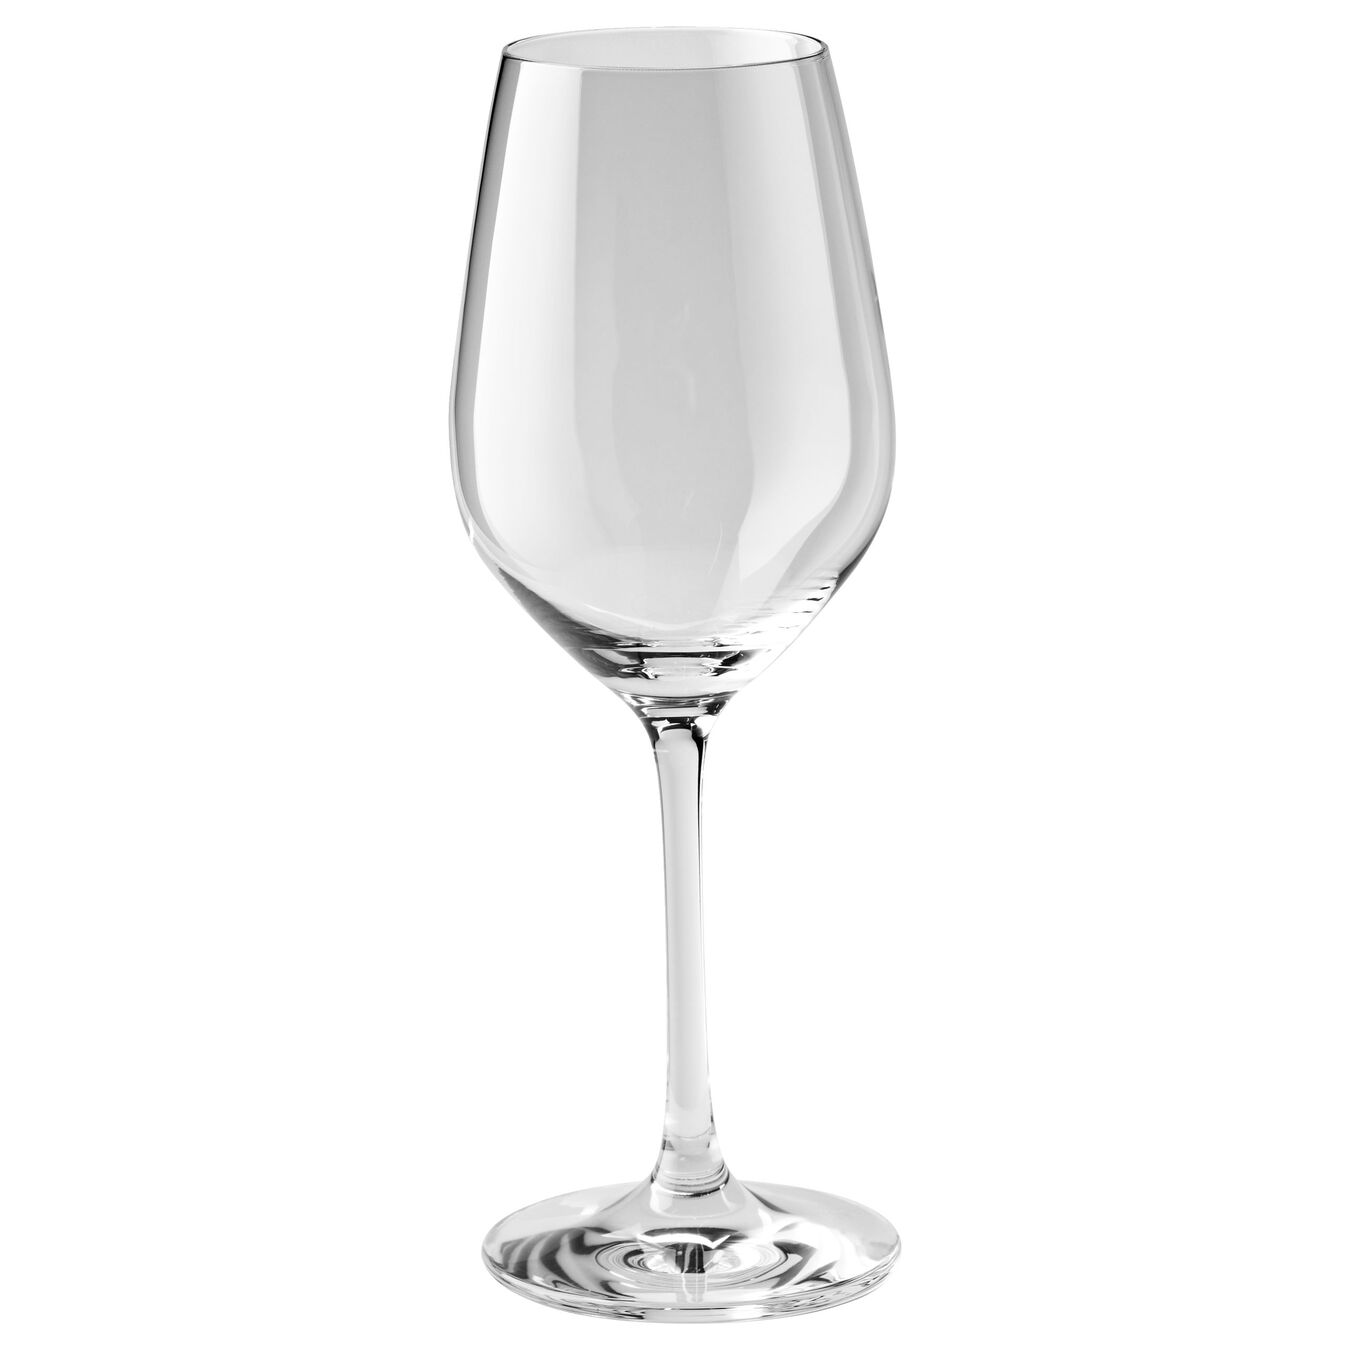 Weissweinglas 275 ml,,large 2